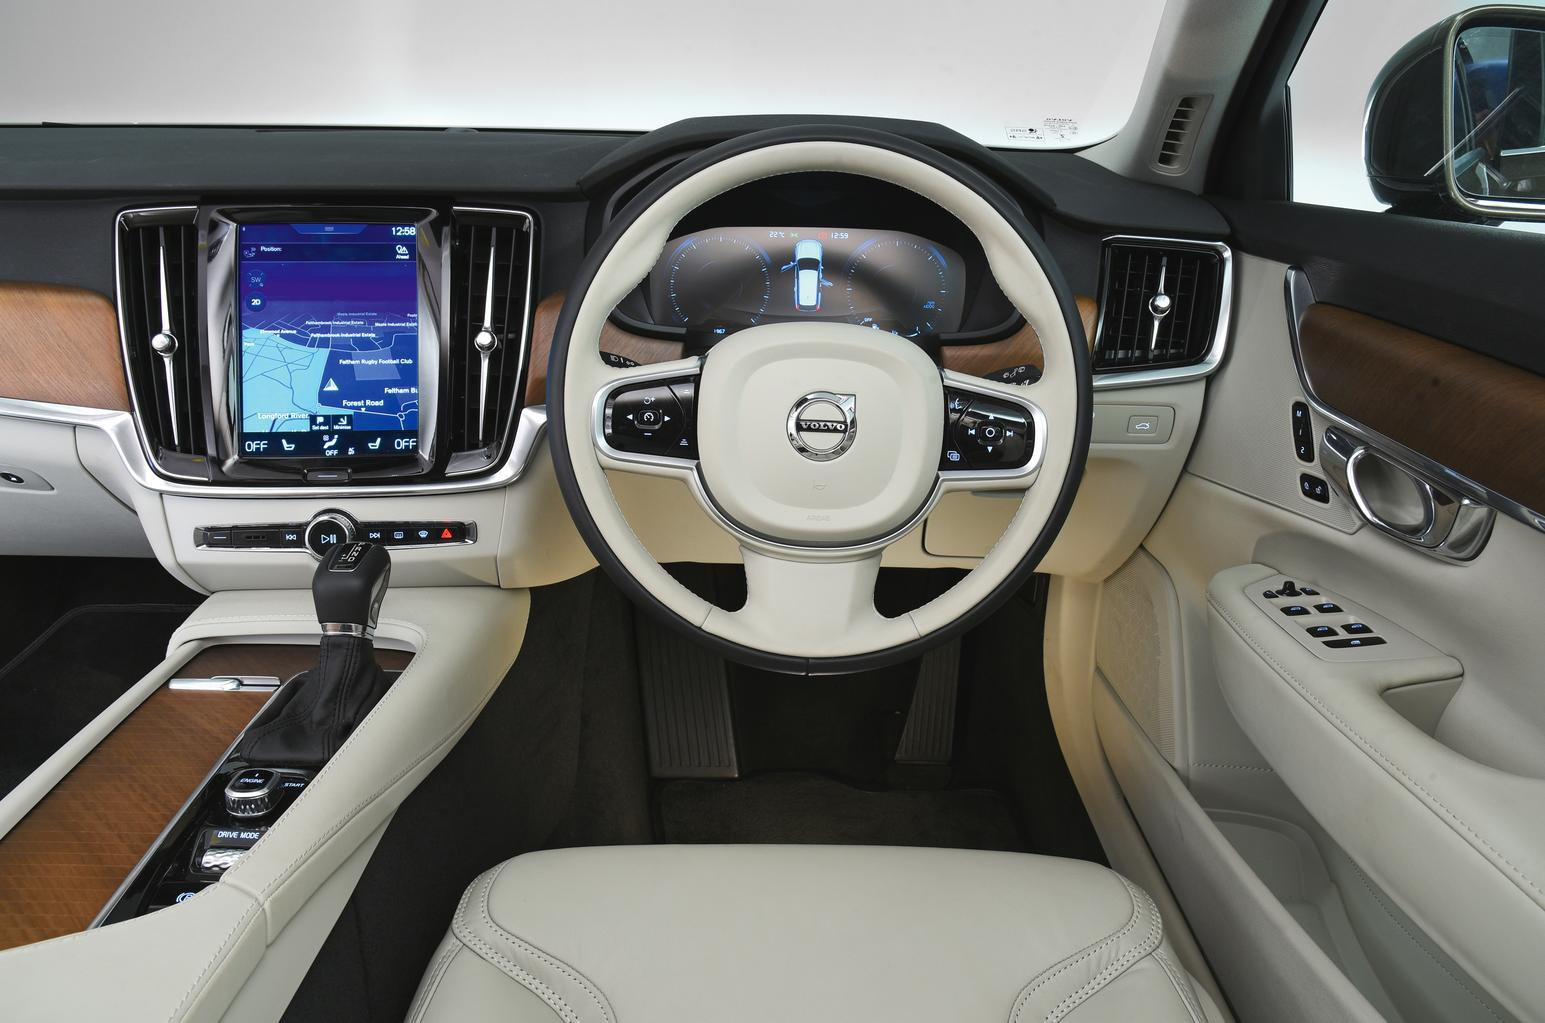 2017 Volvo V90 Cross Country D5 auto - interior